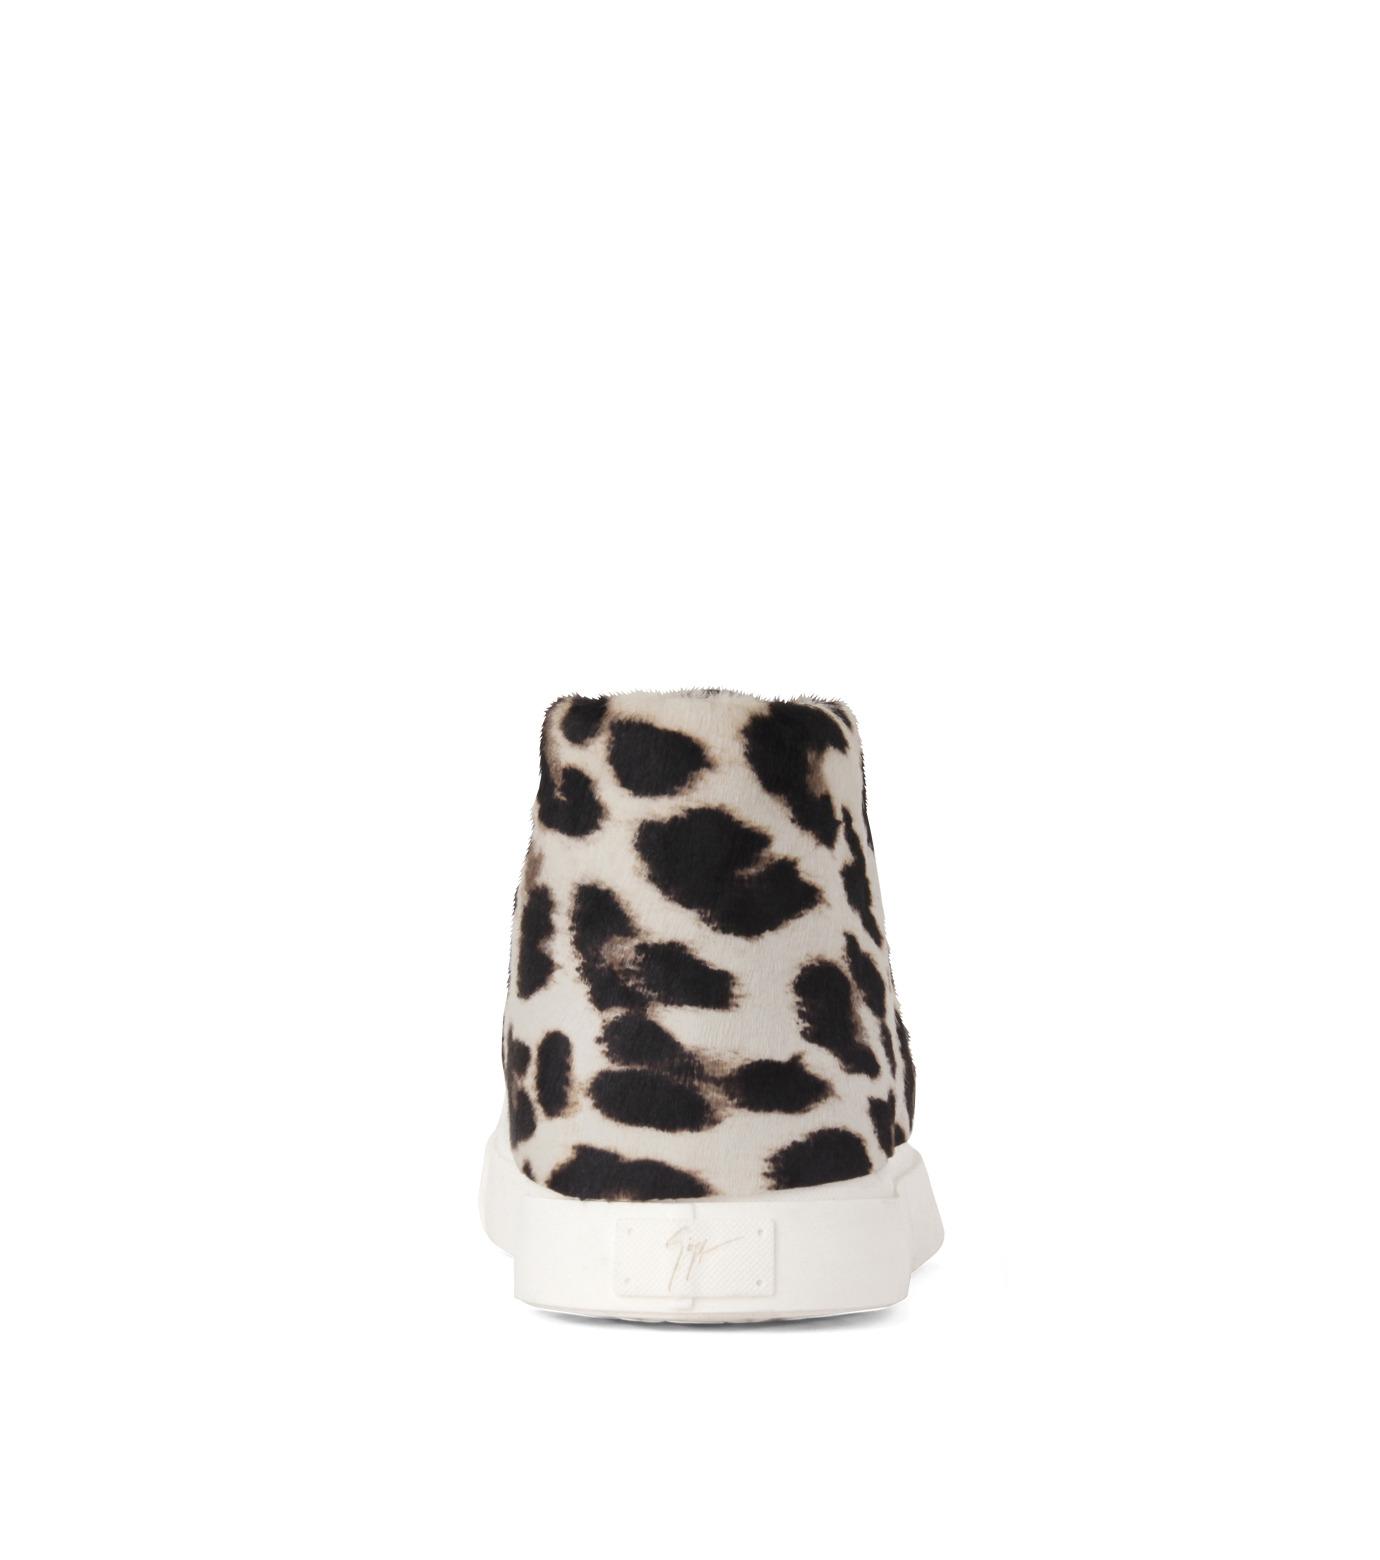 Giuseppe Zanotti Design(ジュゼッペザノッティ)のLeoperd Chucker-CAMEL(シューズ/shoes)-RDM455-NA-53 拡大詳細画像3